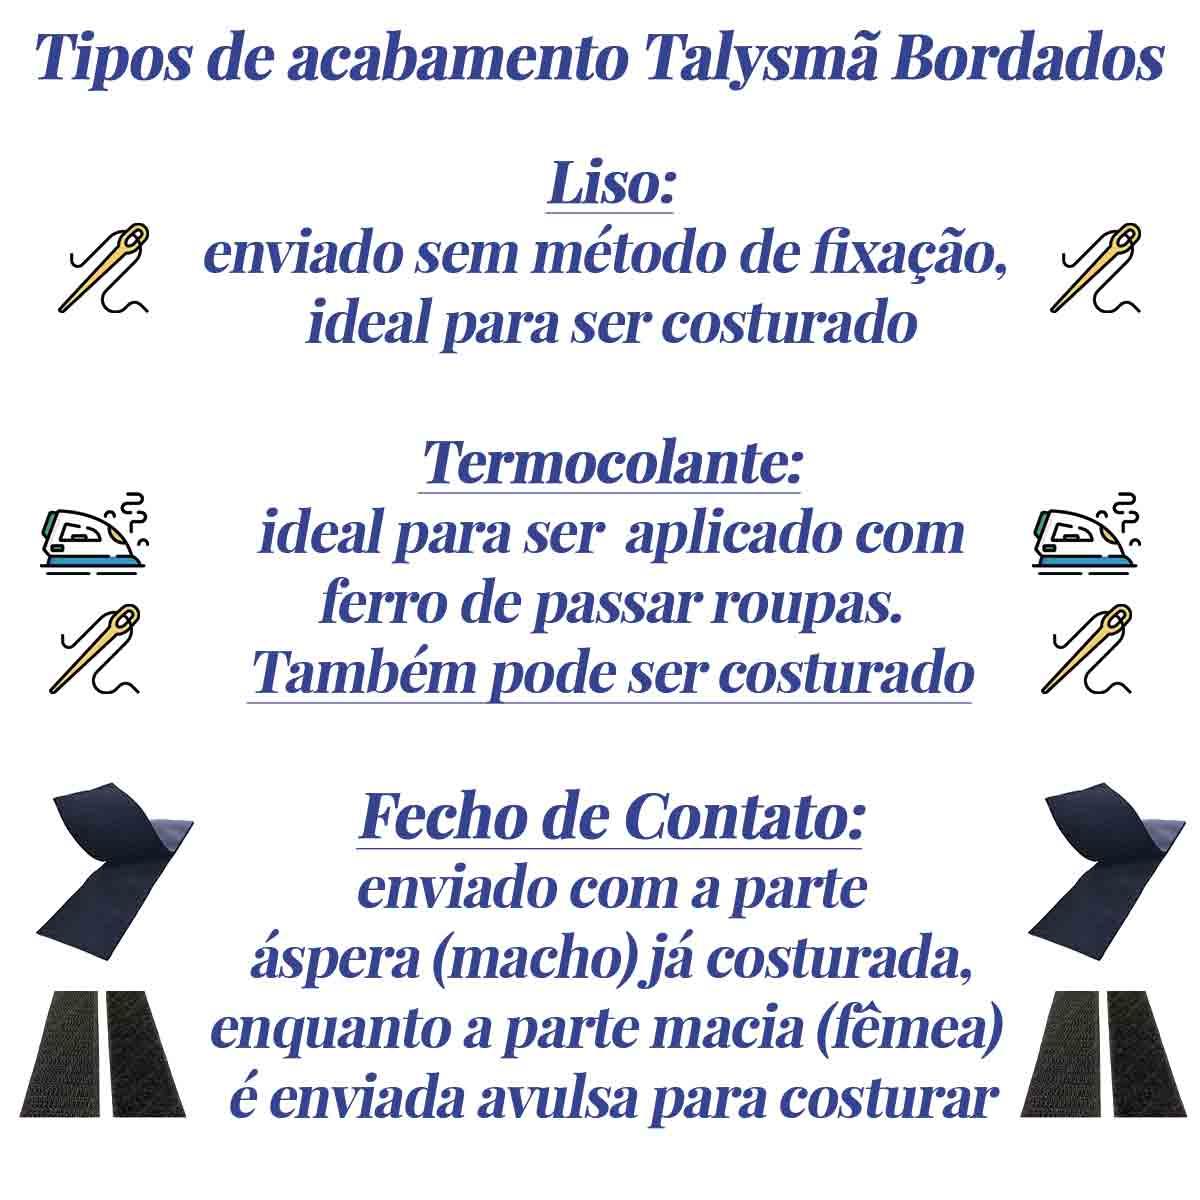 Patch Bordado - Letras Alfabeto P DV80529-419  - Talysmã Bordados